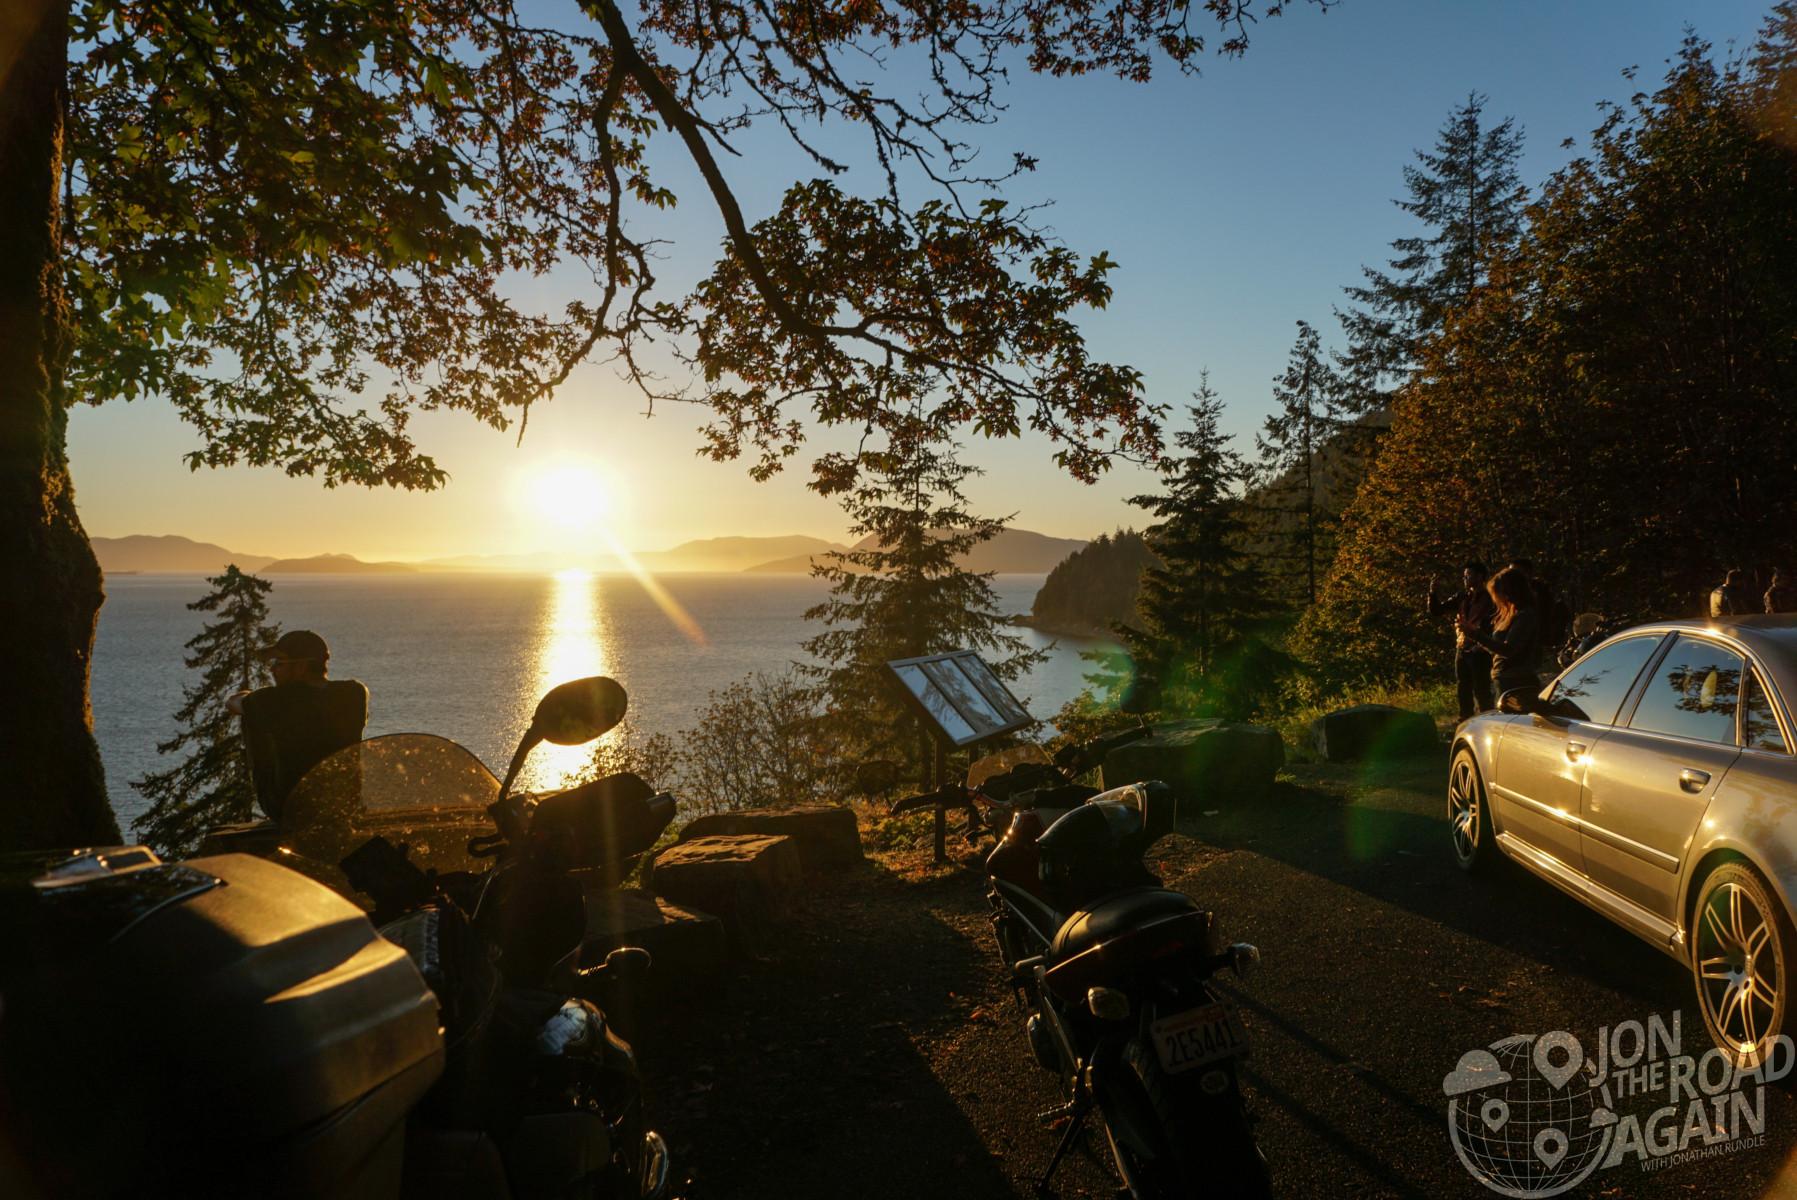 Sunset on Chucknut Drive